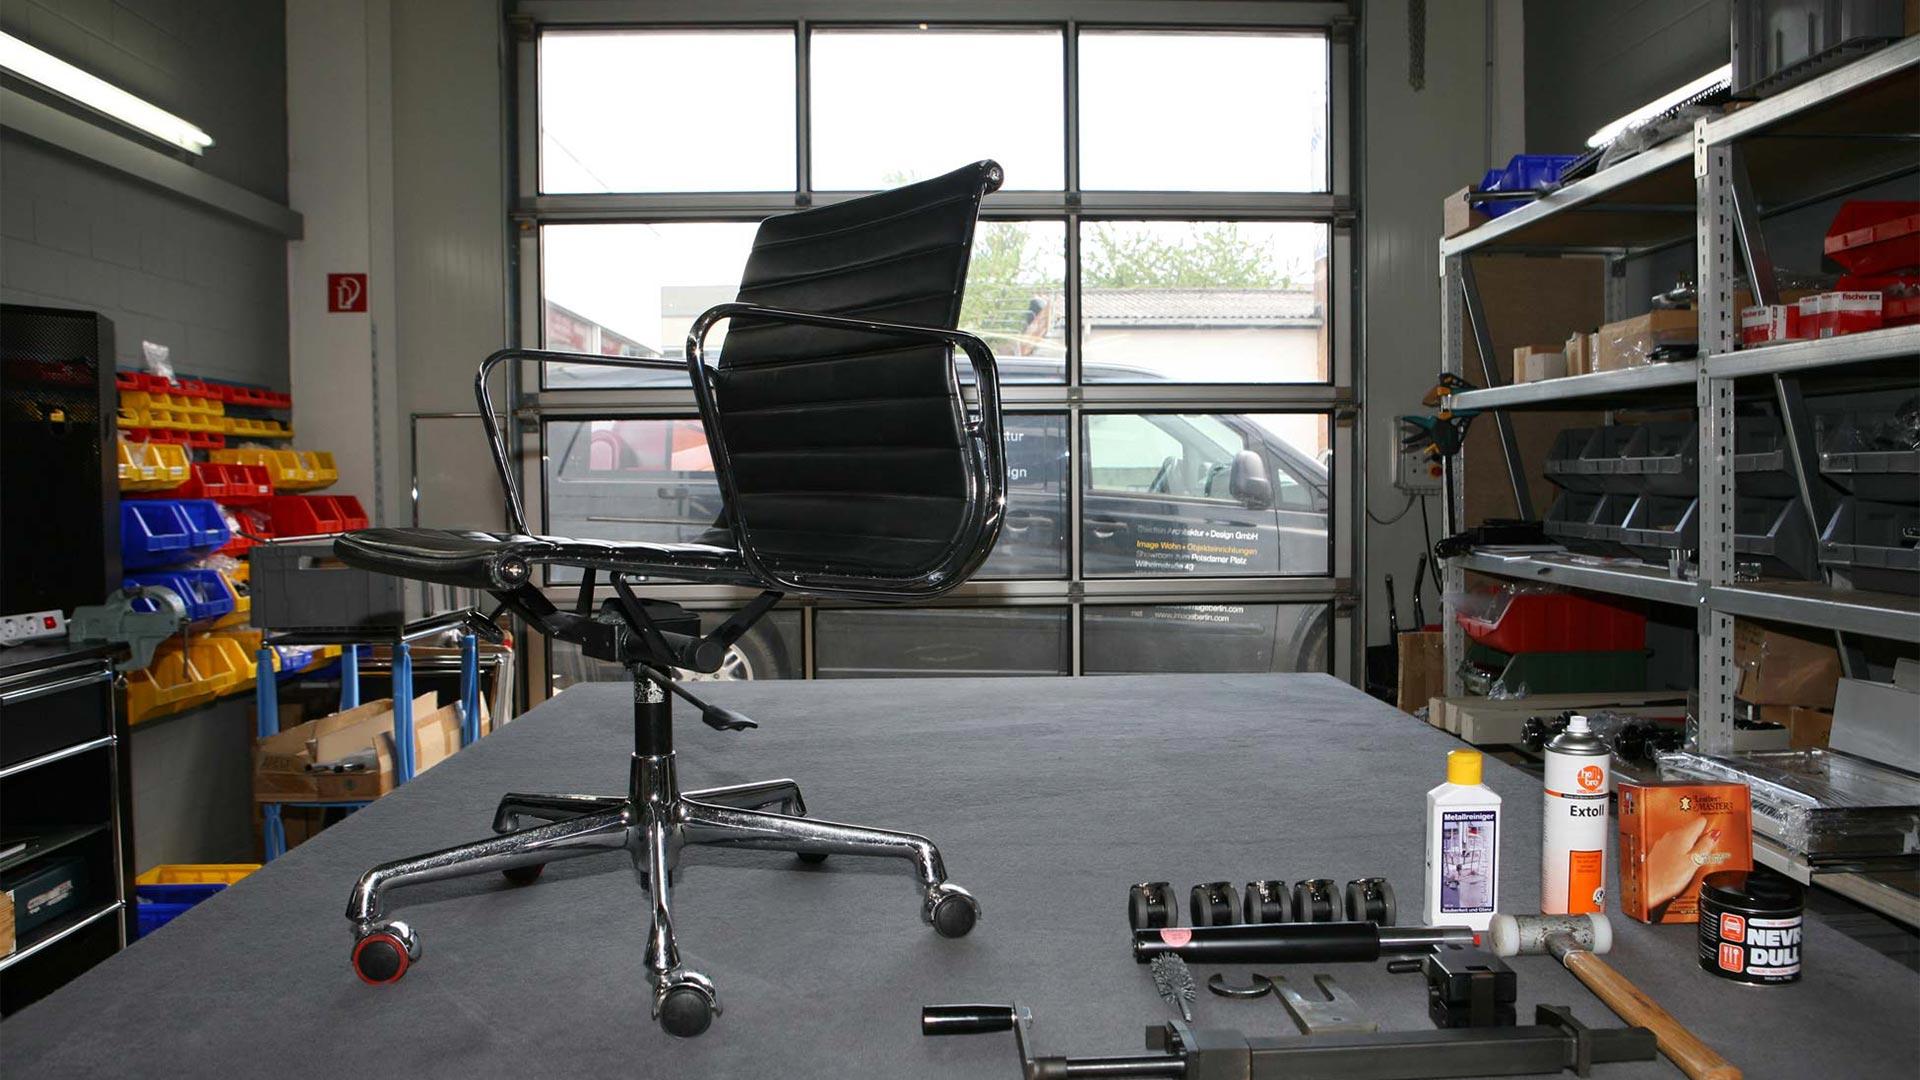 Vitra Ersatzteilservice + Reparatur Eames alu Chair in Berlin bei steidten+01